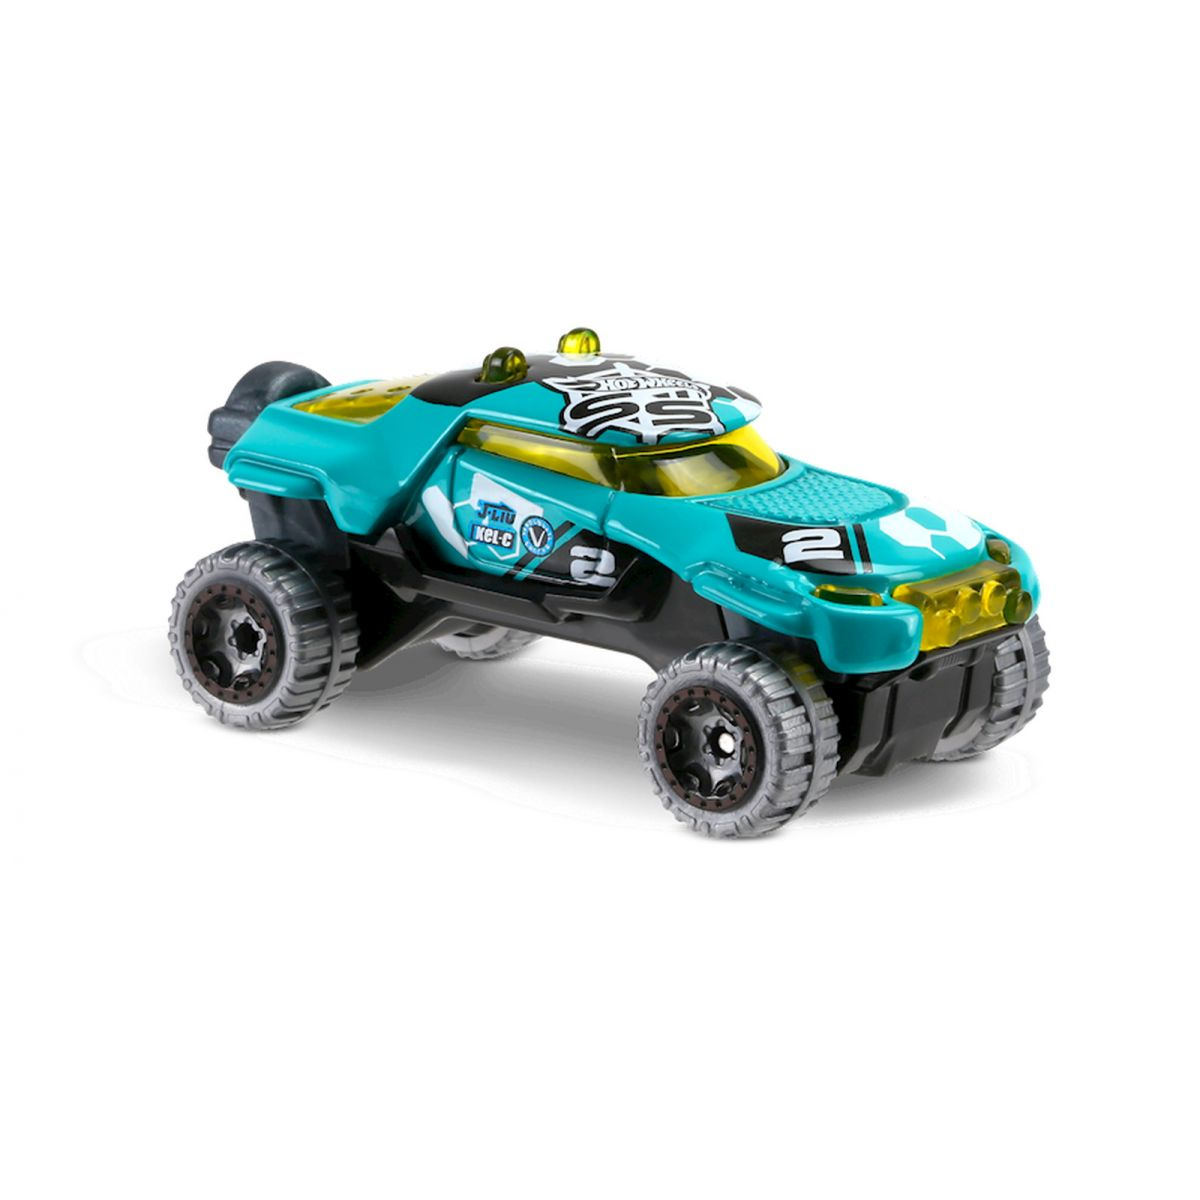 Terrain Storm - Hot Wheels